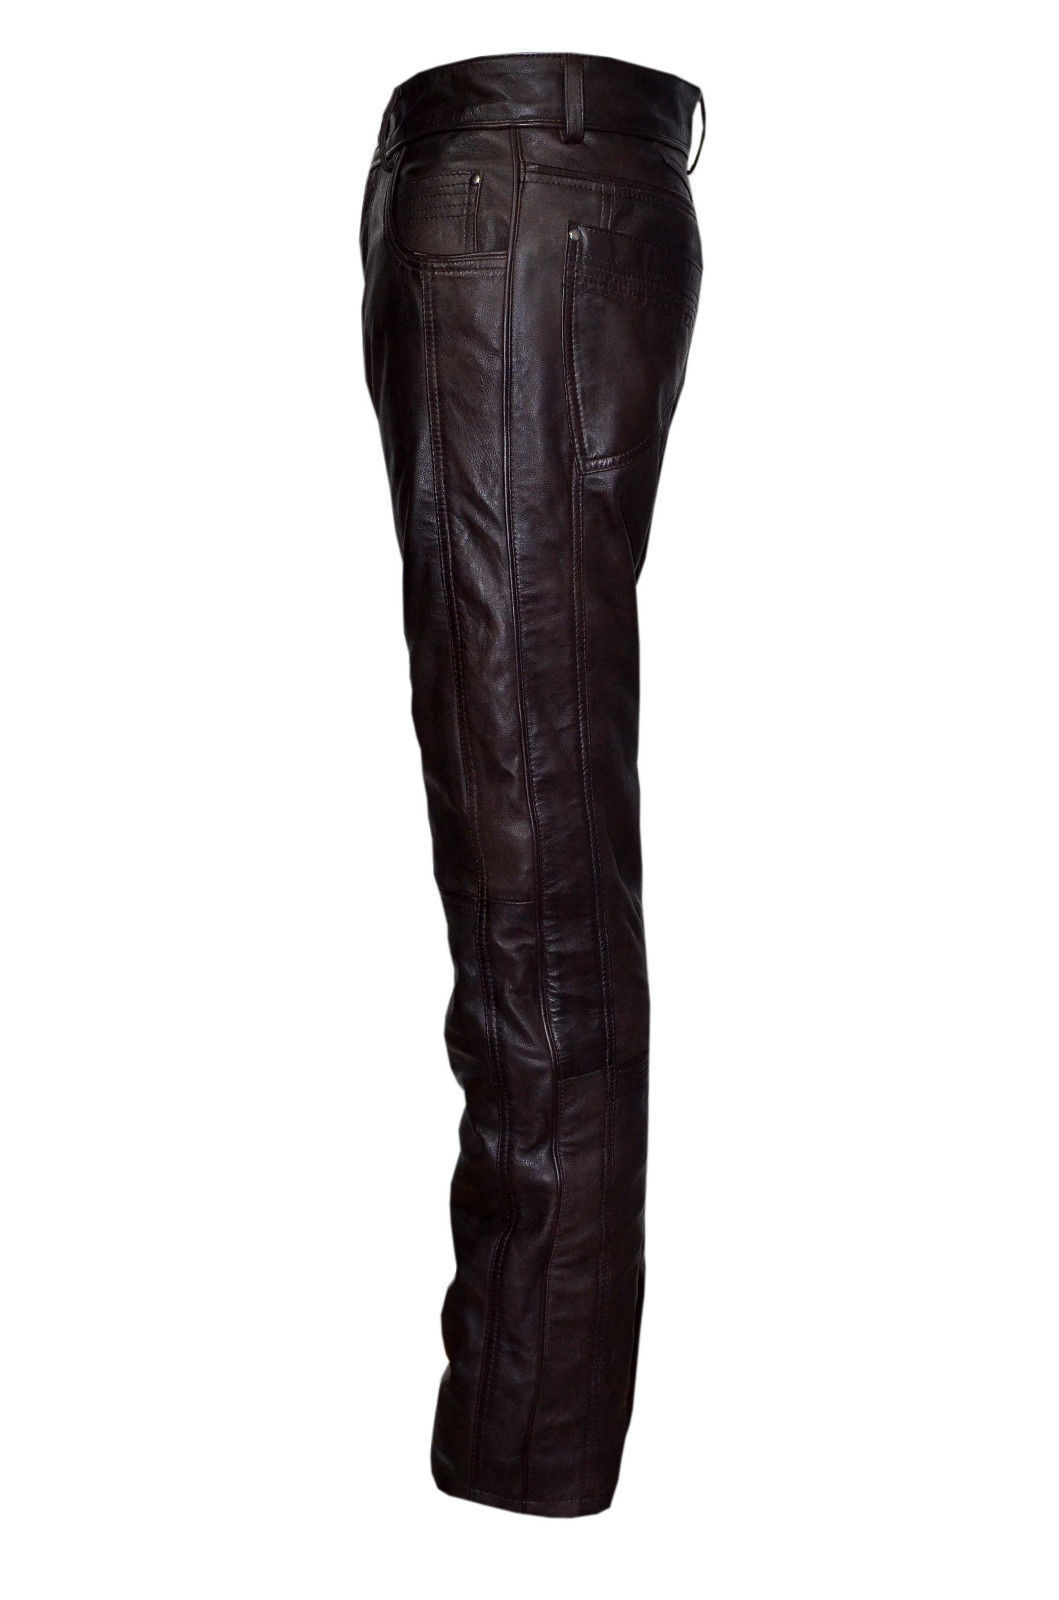 Da Uomo Classici Slim Fit Stile Biker Pantaloni Pantaloni Pantaloni In Pelle Marronee Napa JEANS DA MOTO edc99d